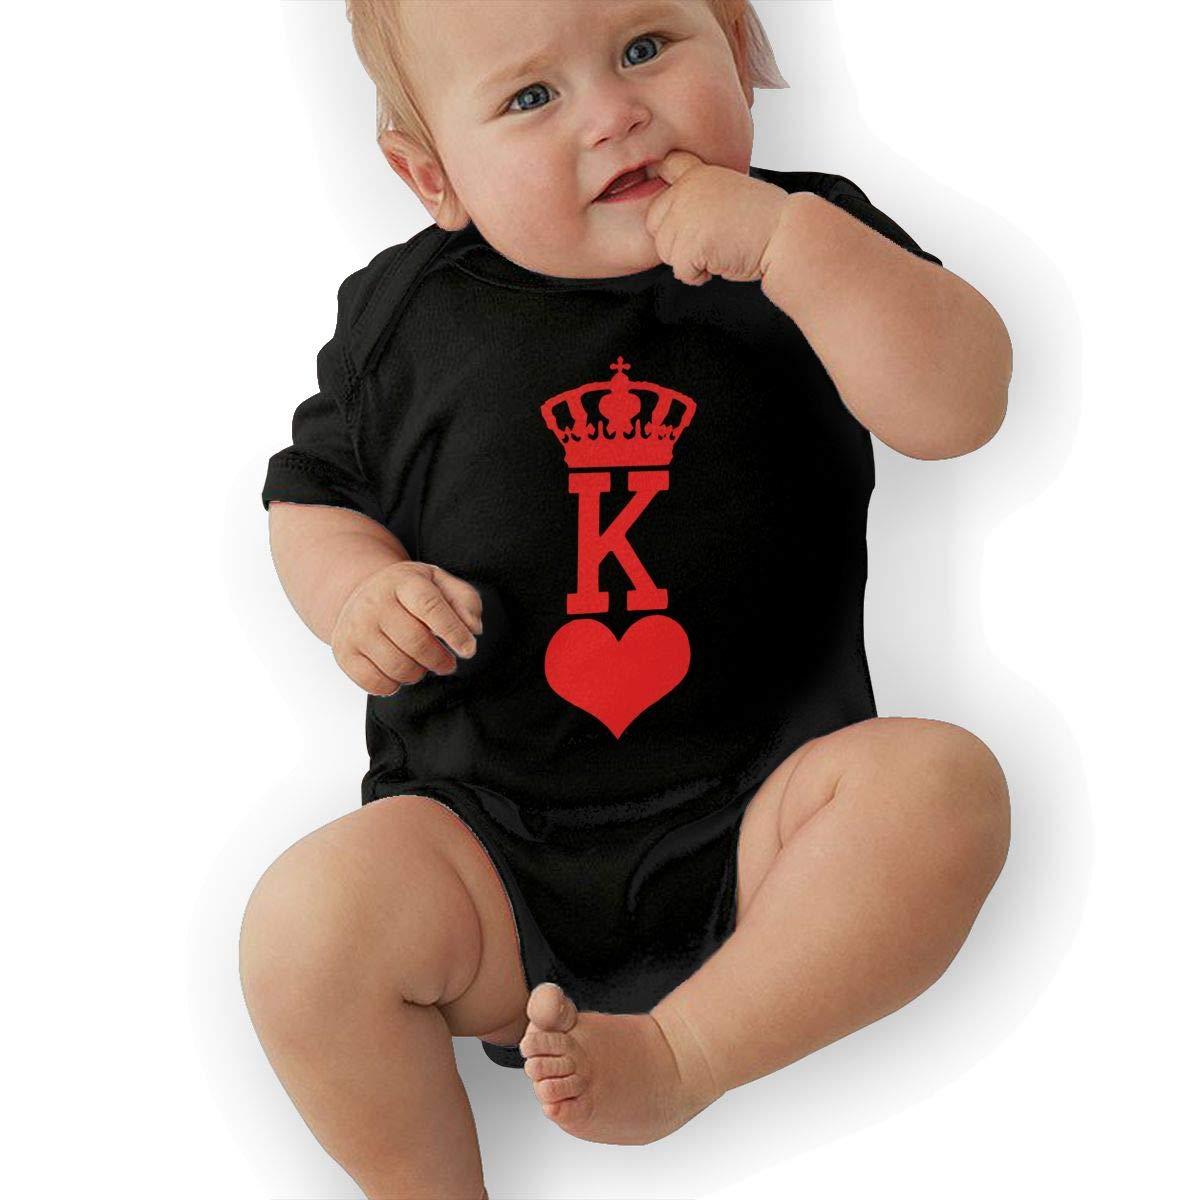 King of Hearts Poker Baby Boys Girls Jumpsuits Short Sleeve Romper Bodysuit Bodysuit Jumpsuit Outfits Black